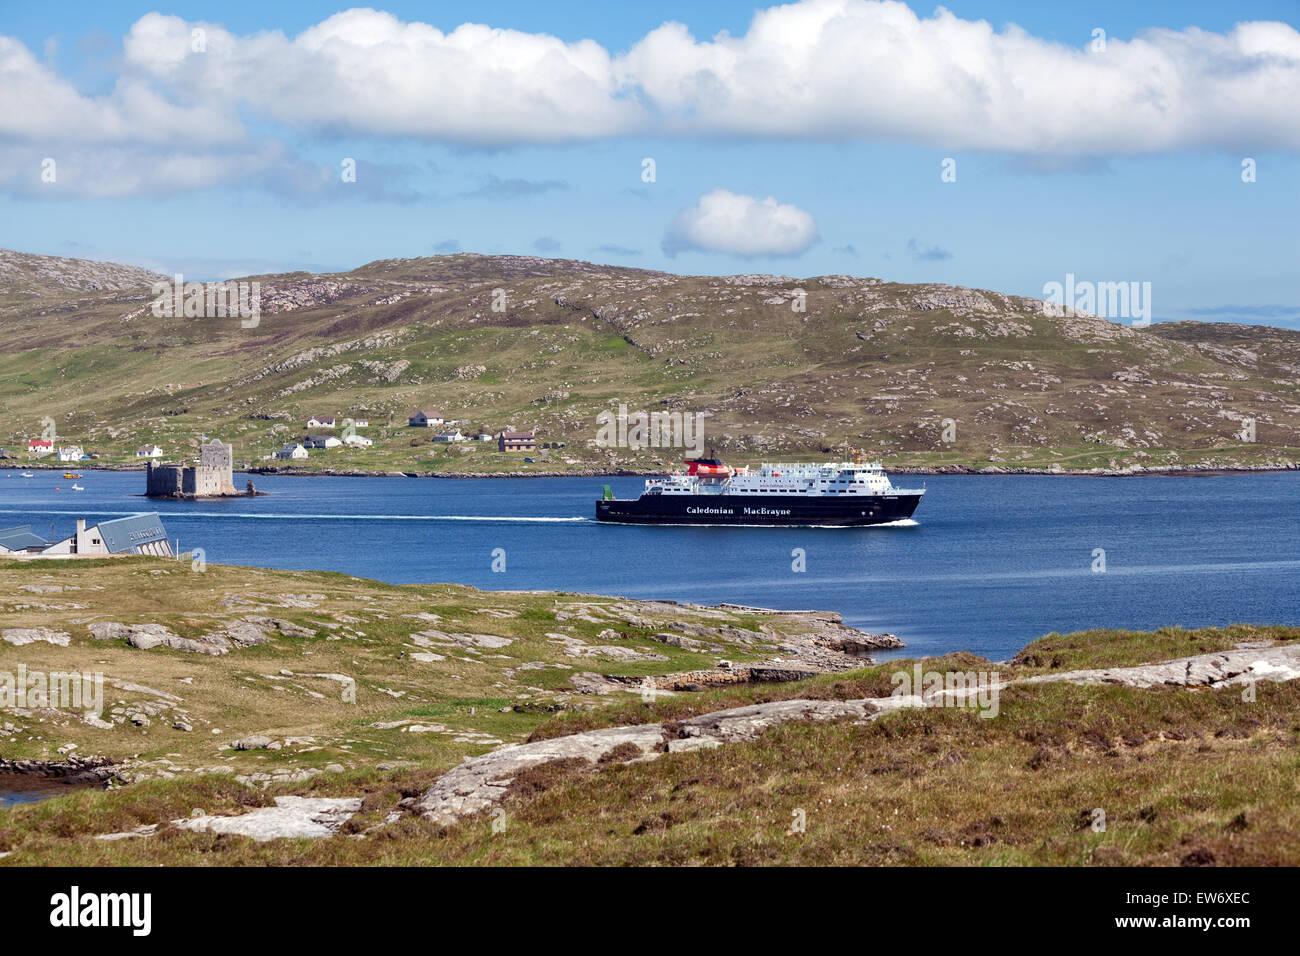 Cal Mac ferry leaving Castlebay, Barra - Stock Image